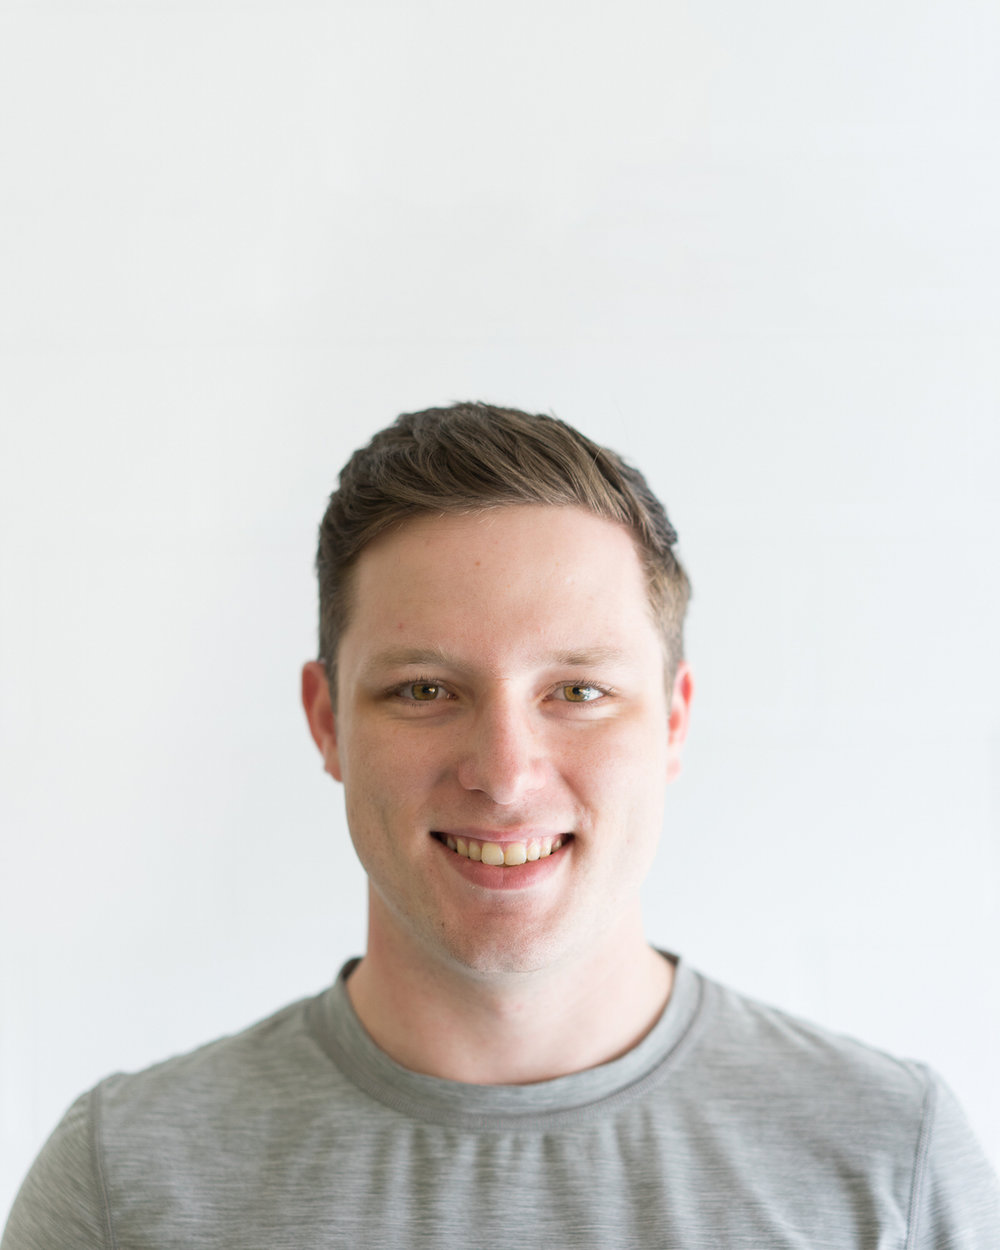 Keenan Burnett<br>Team Lead / Systems Engineer